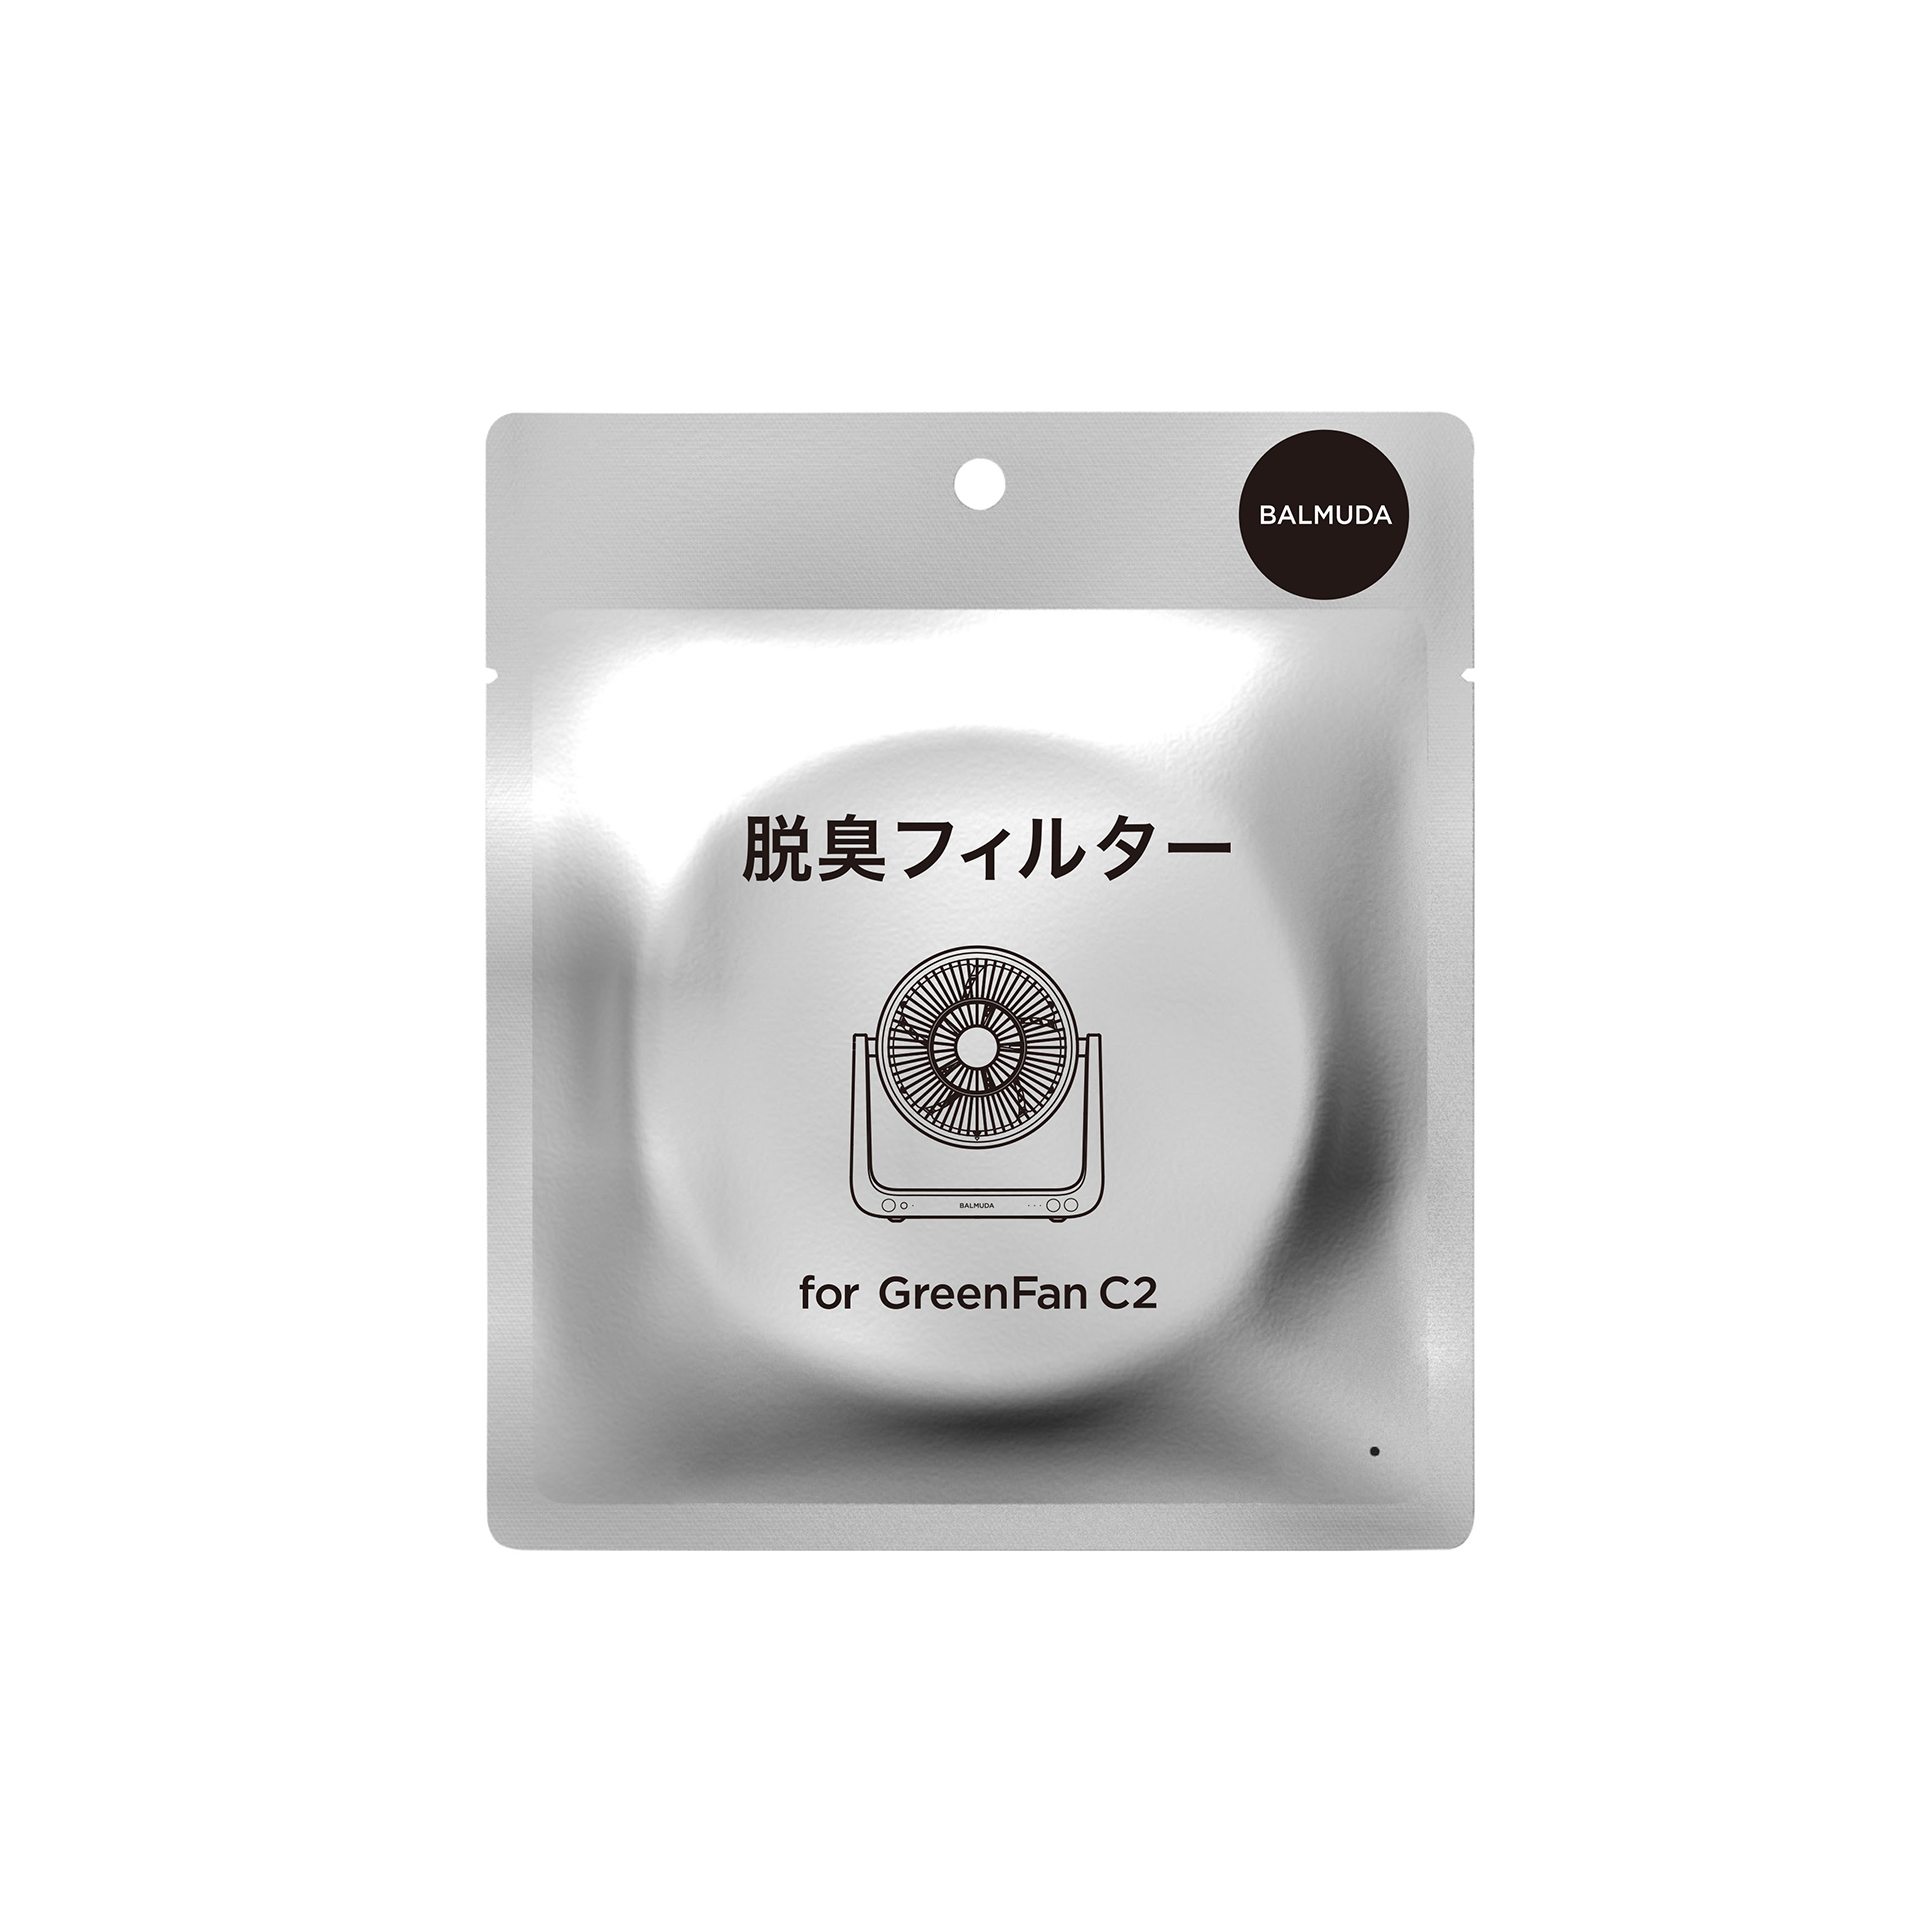 A02D-D100 循環扇 除臭濾網